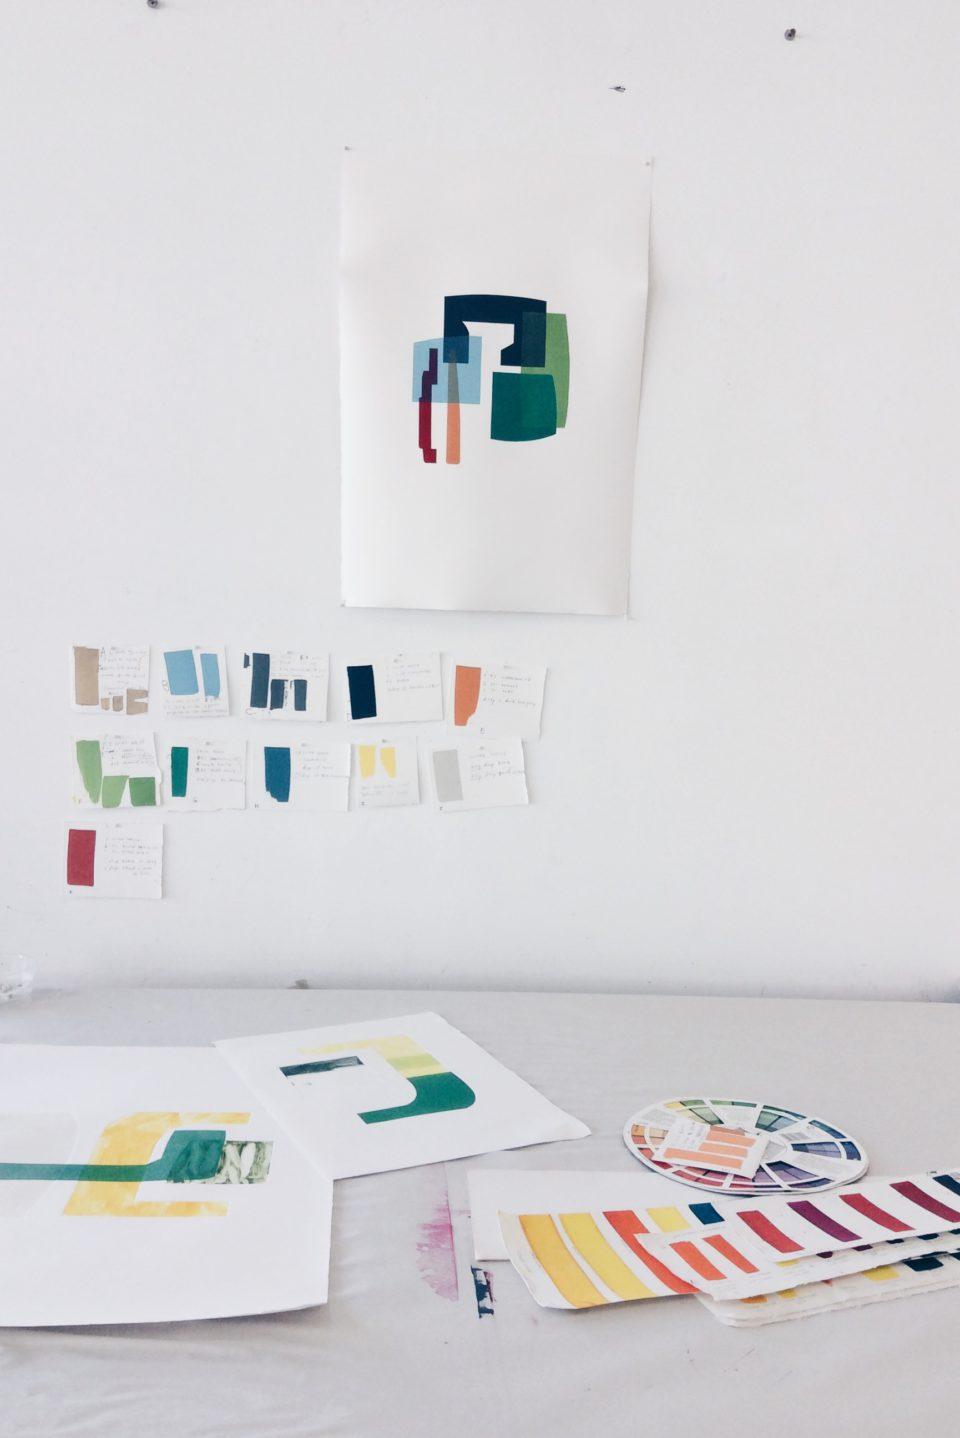 Hugh Byrne monotype prints